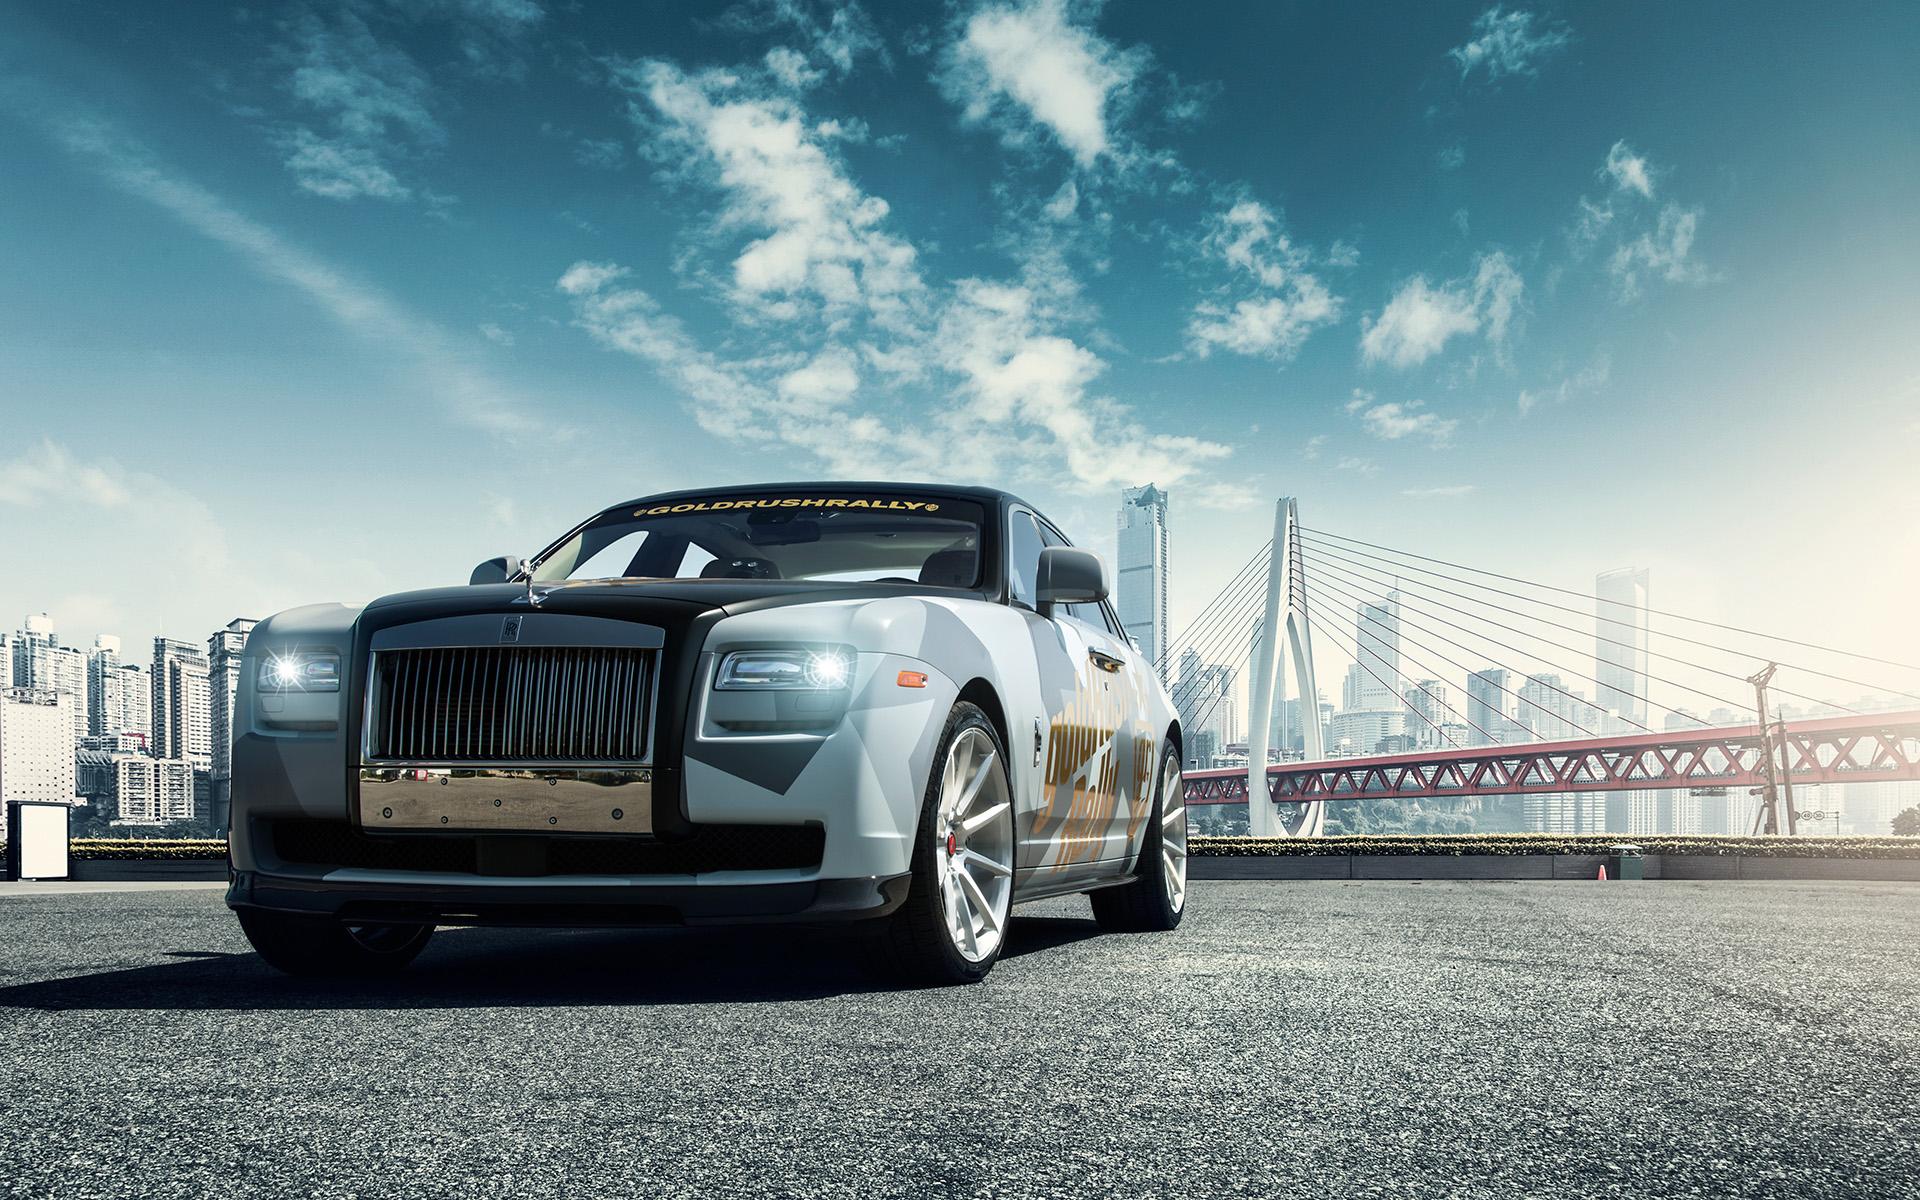 Ultra Hd Rolls Royce Ghost Wallpapers 1920x1200 Wallpaper Teahub Io